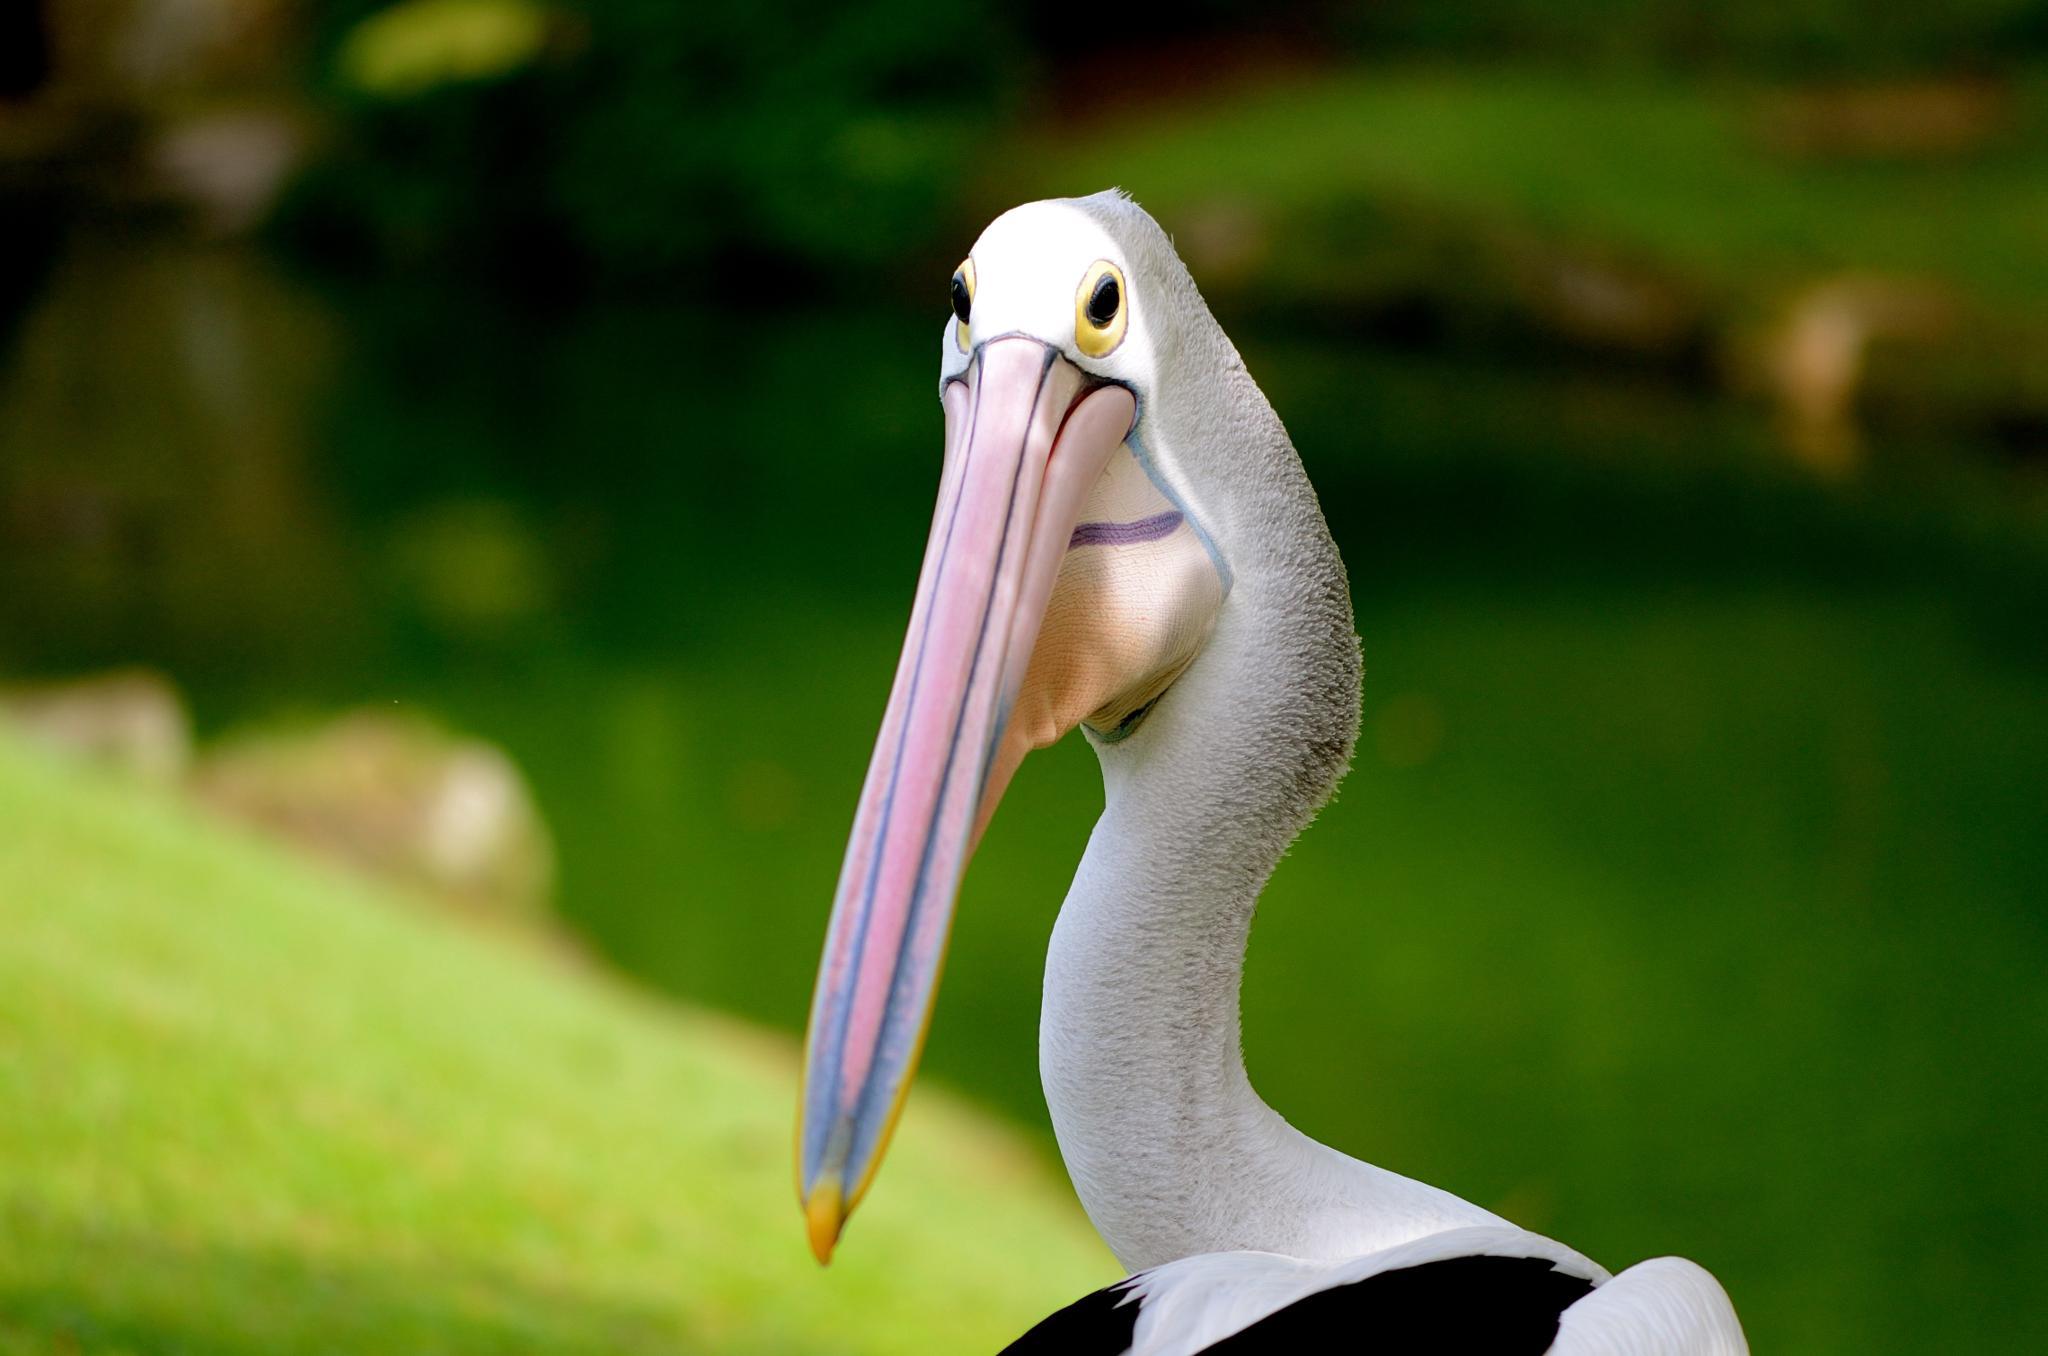 Long Beak by Yulius B Susilo